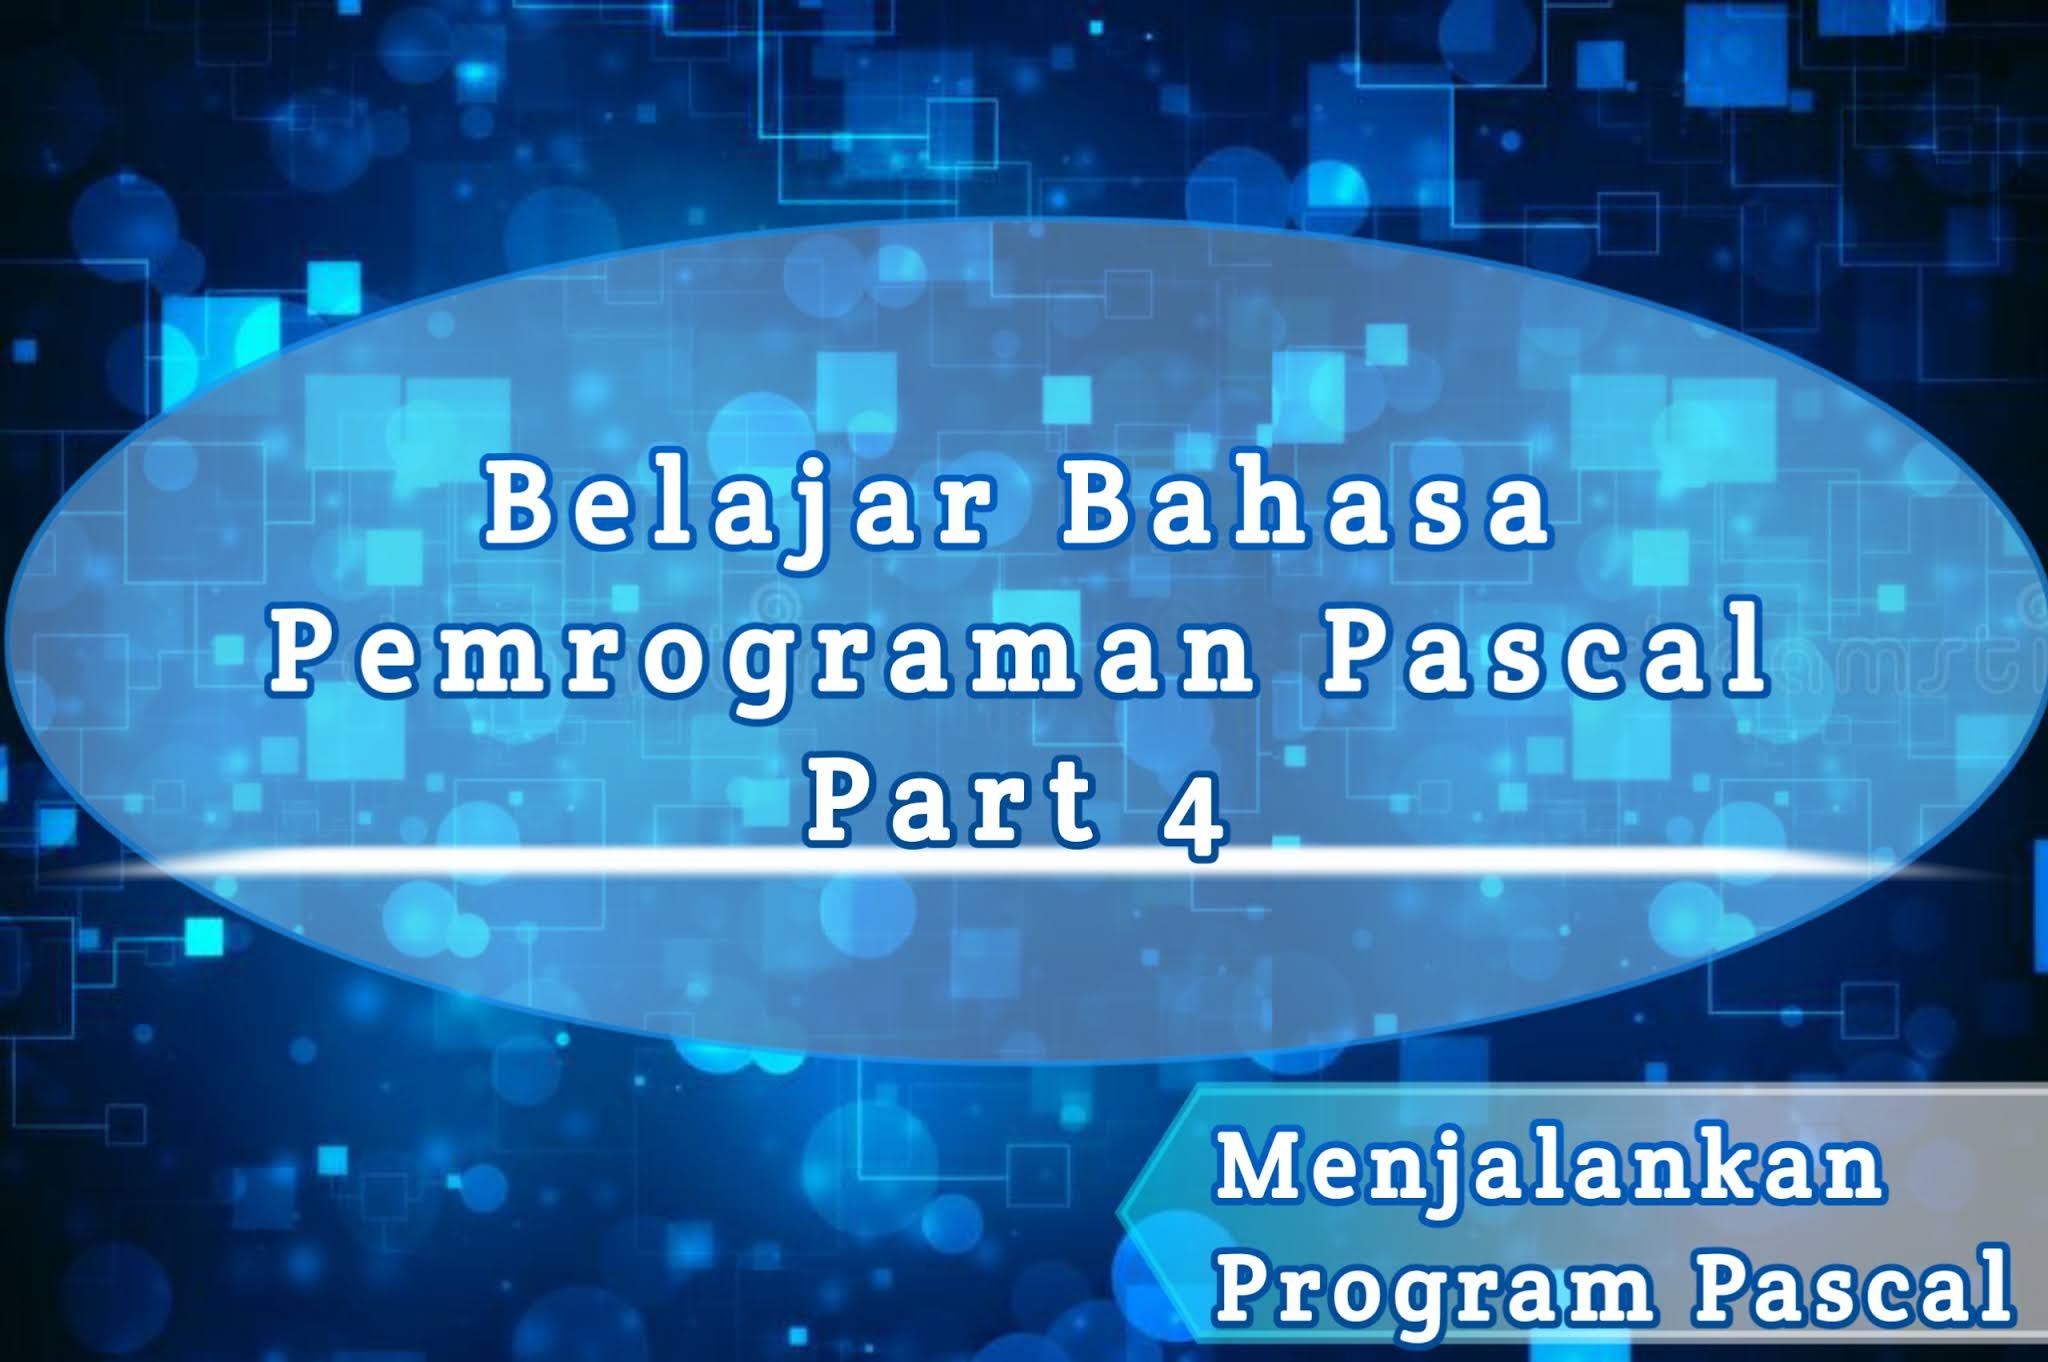 Belajar Pascal Part 4: Menjalankan Program Pascal